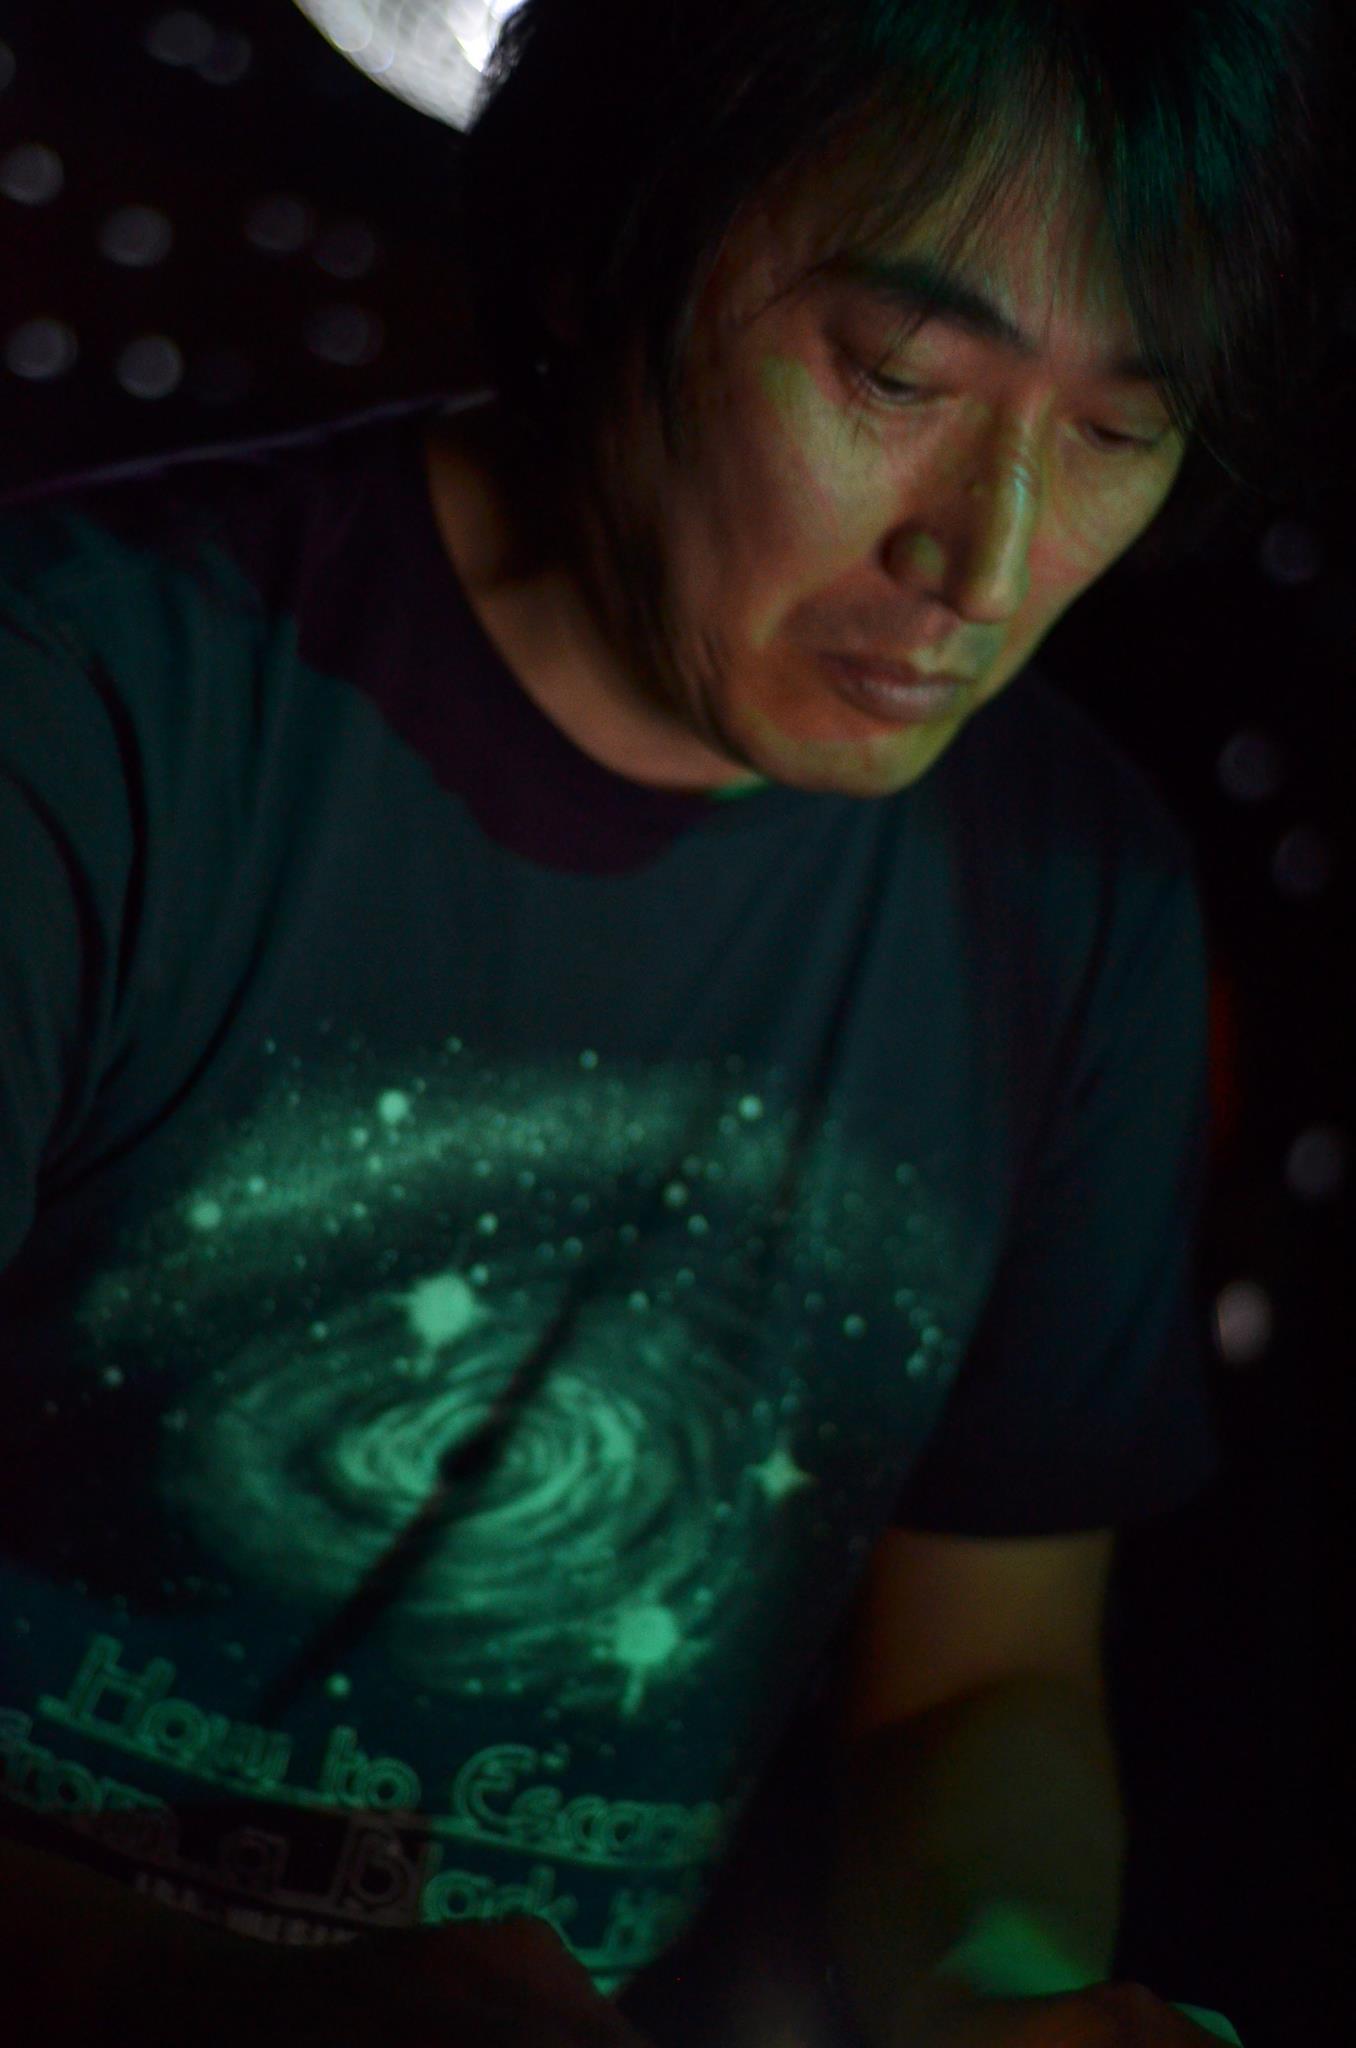 Takuya Yamashita, zwartkrijt artist